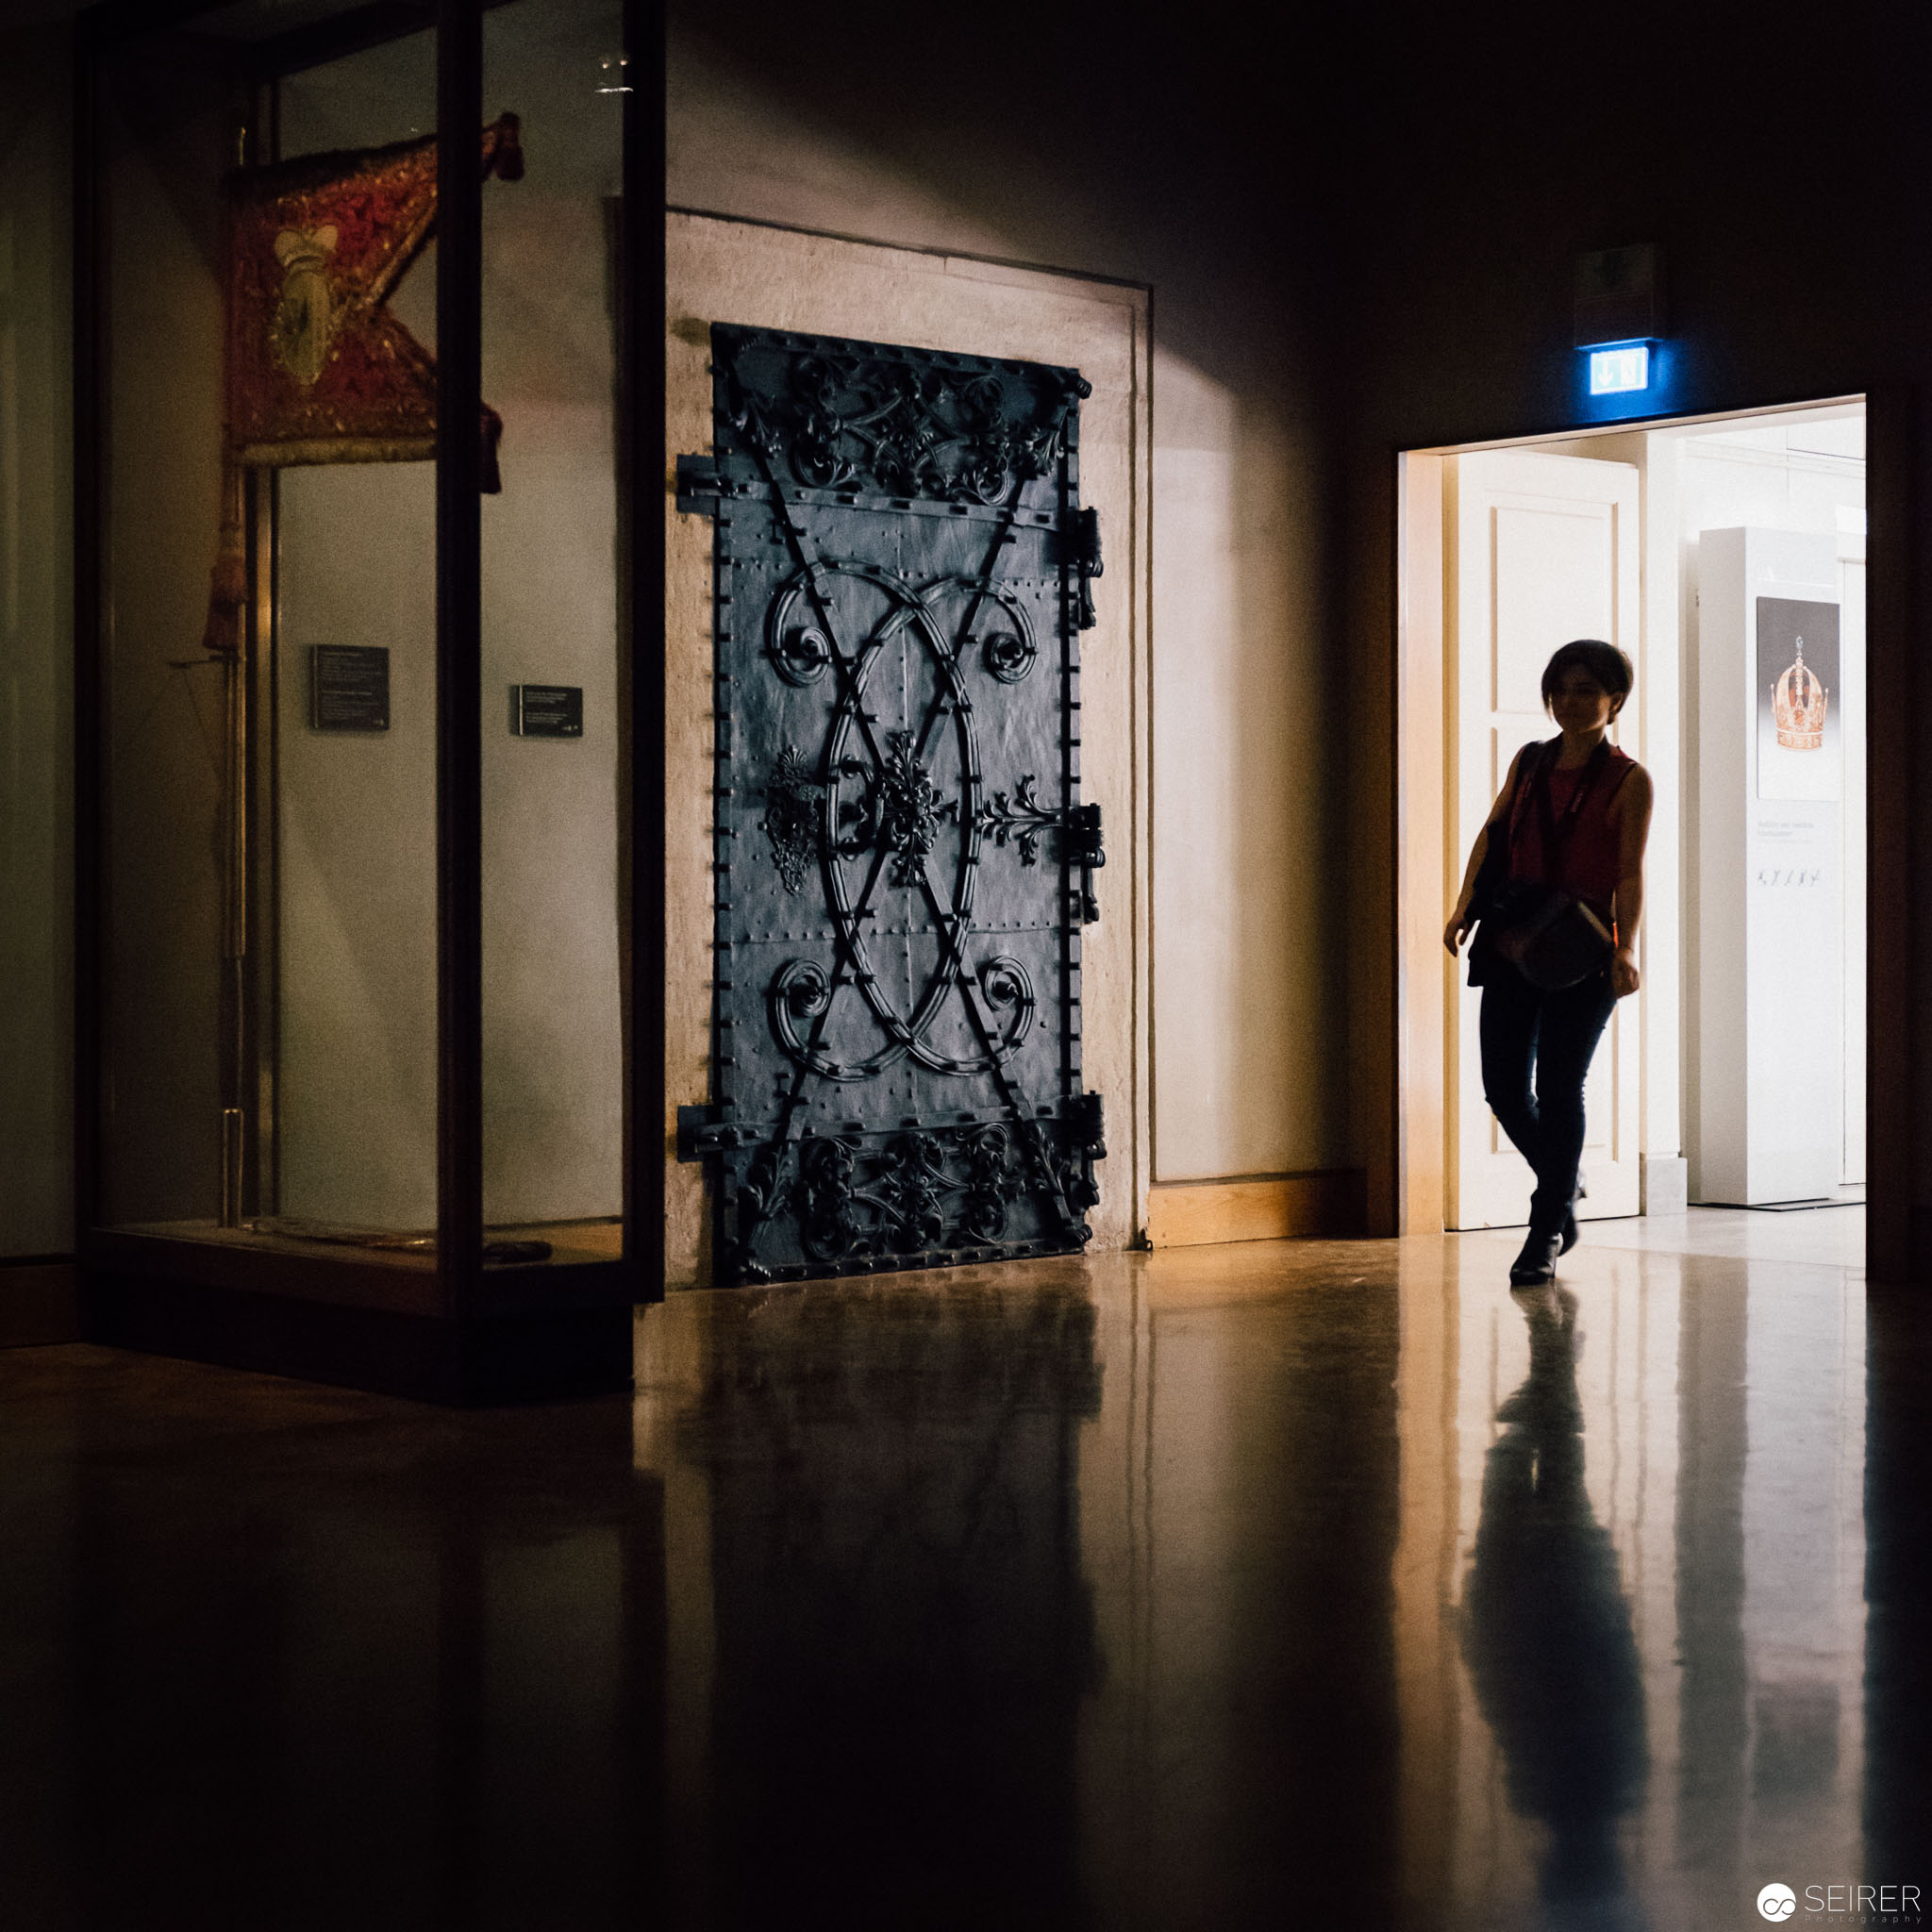 Eingang zur Schatzkammer Wien